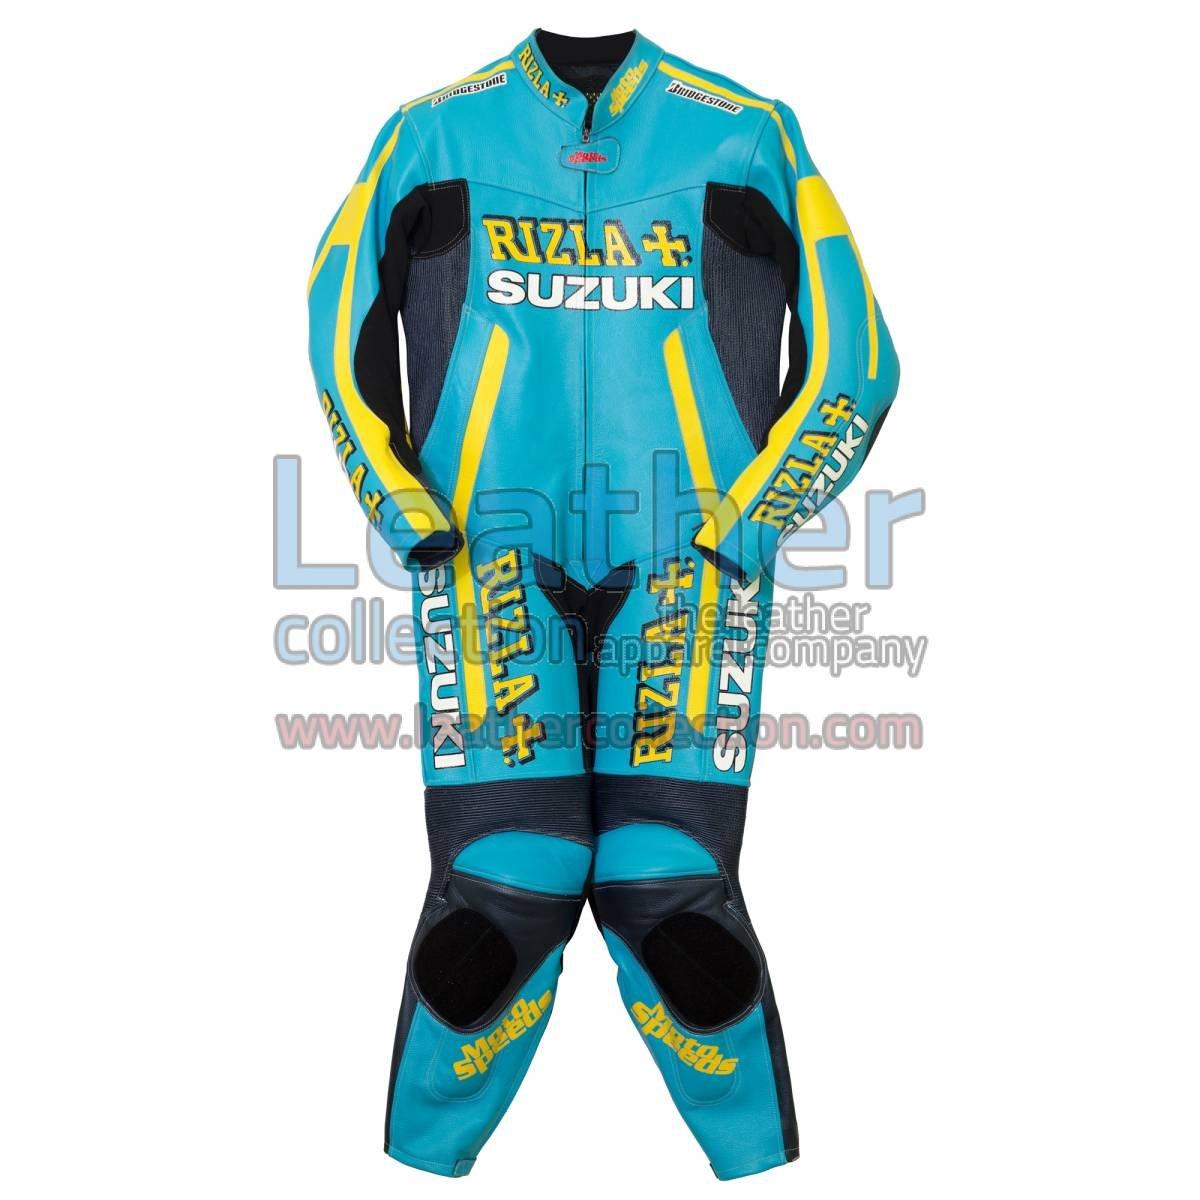 Rizla Suzuki Motorbike Race Leather Suit